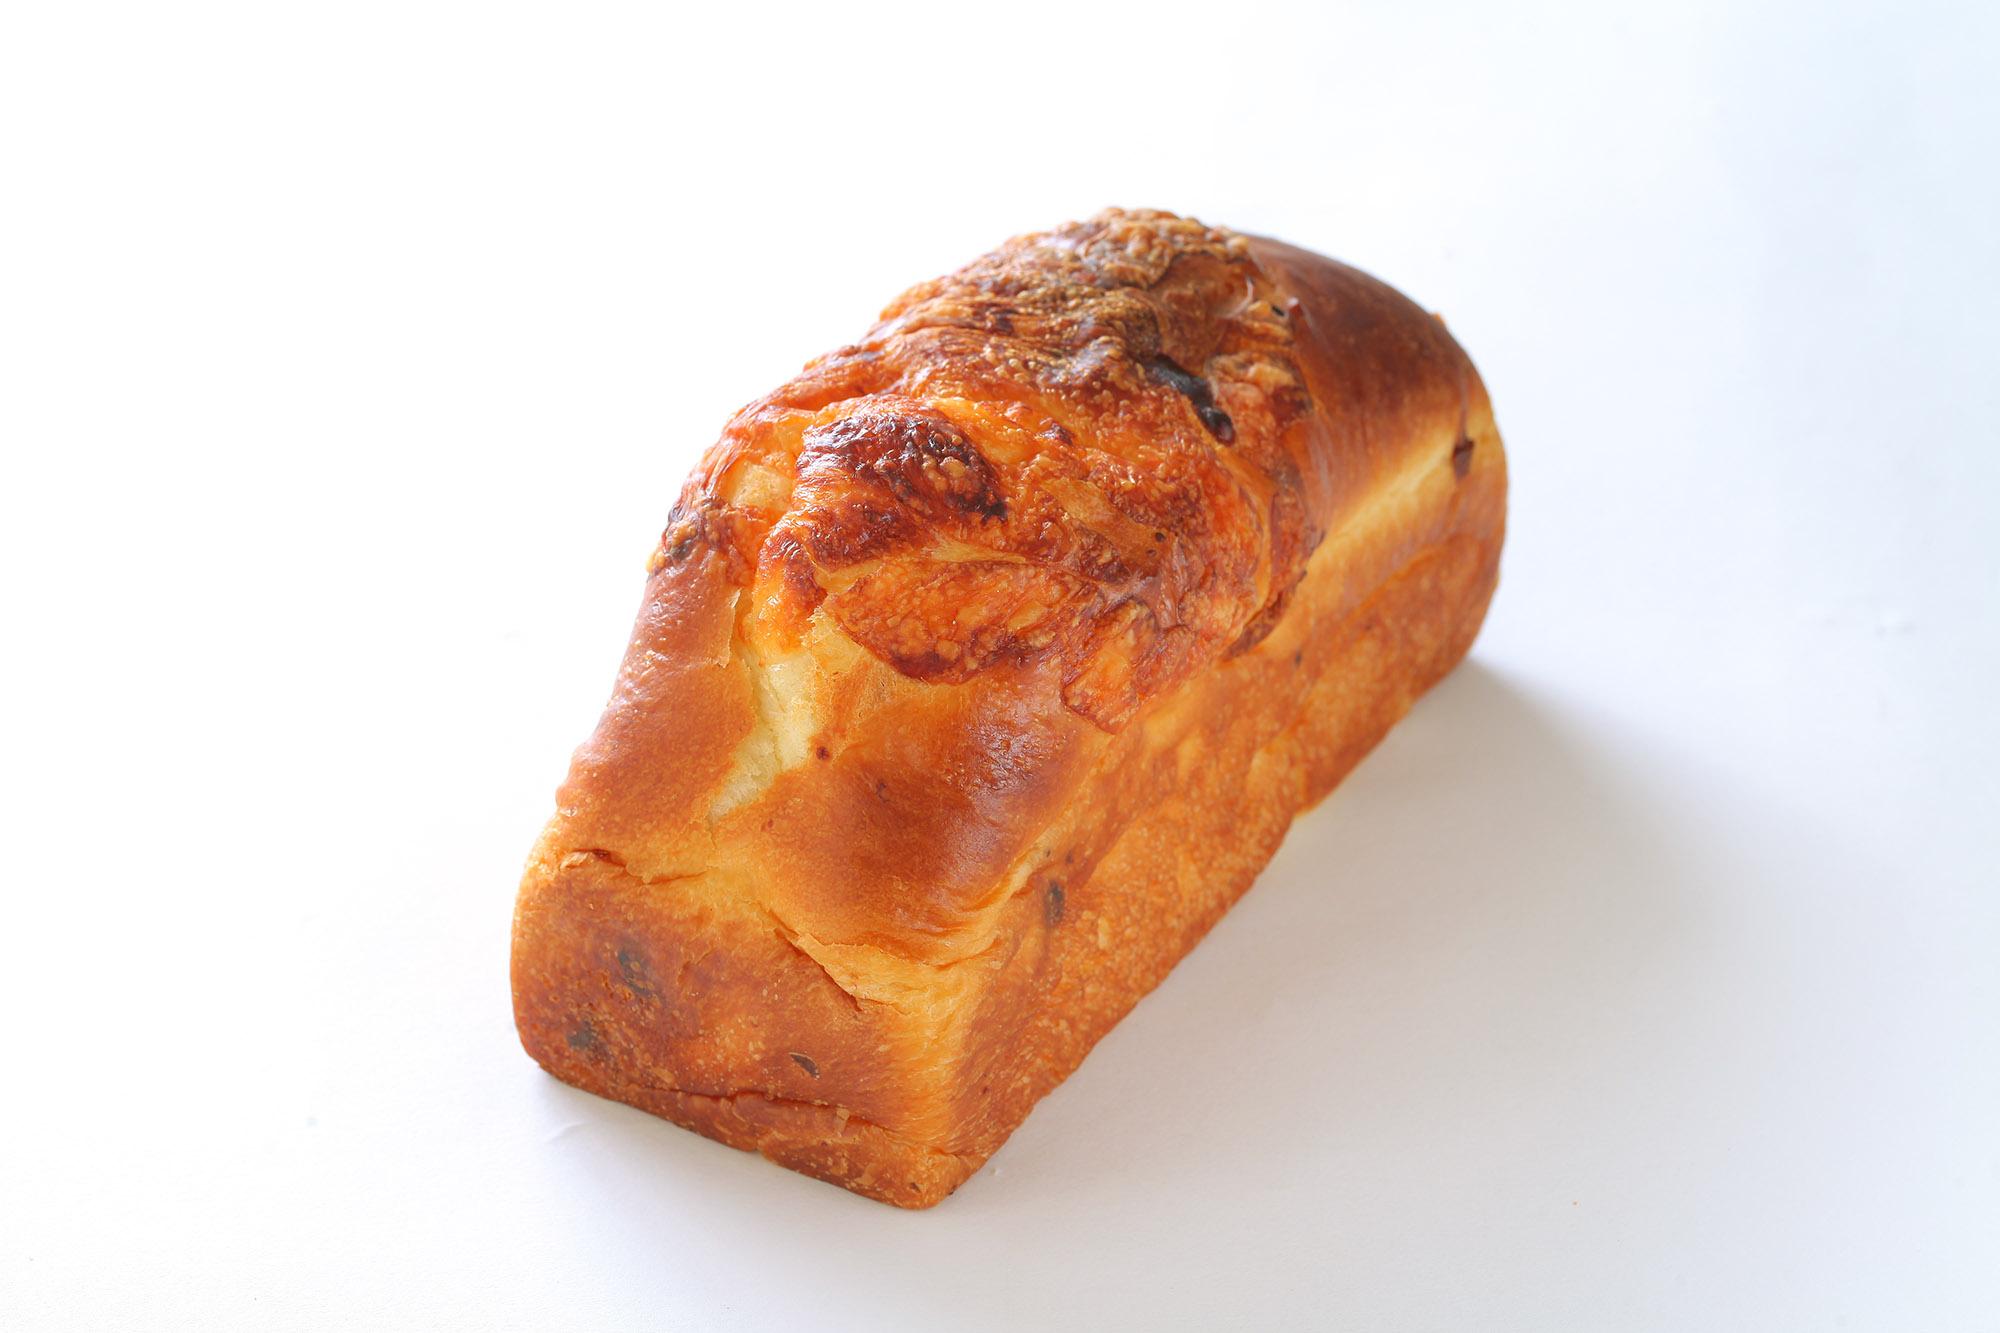 sho_cheesebread01